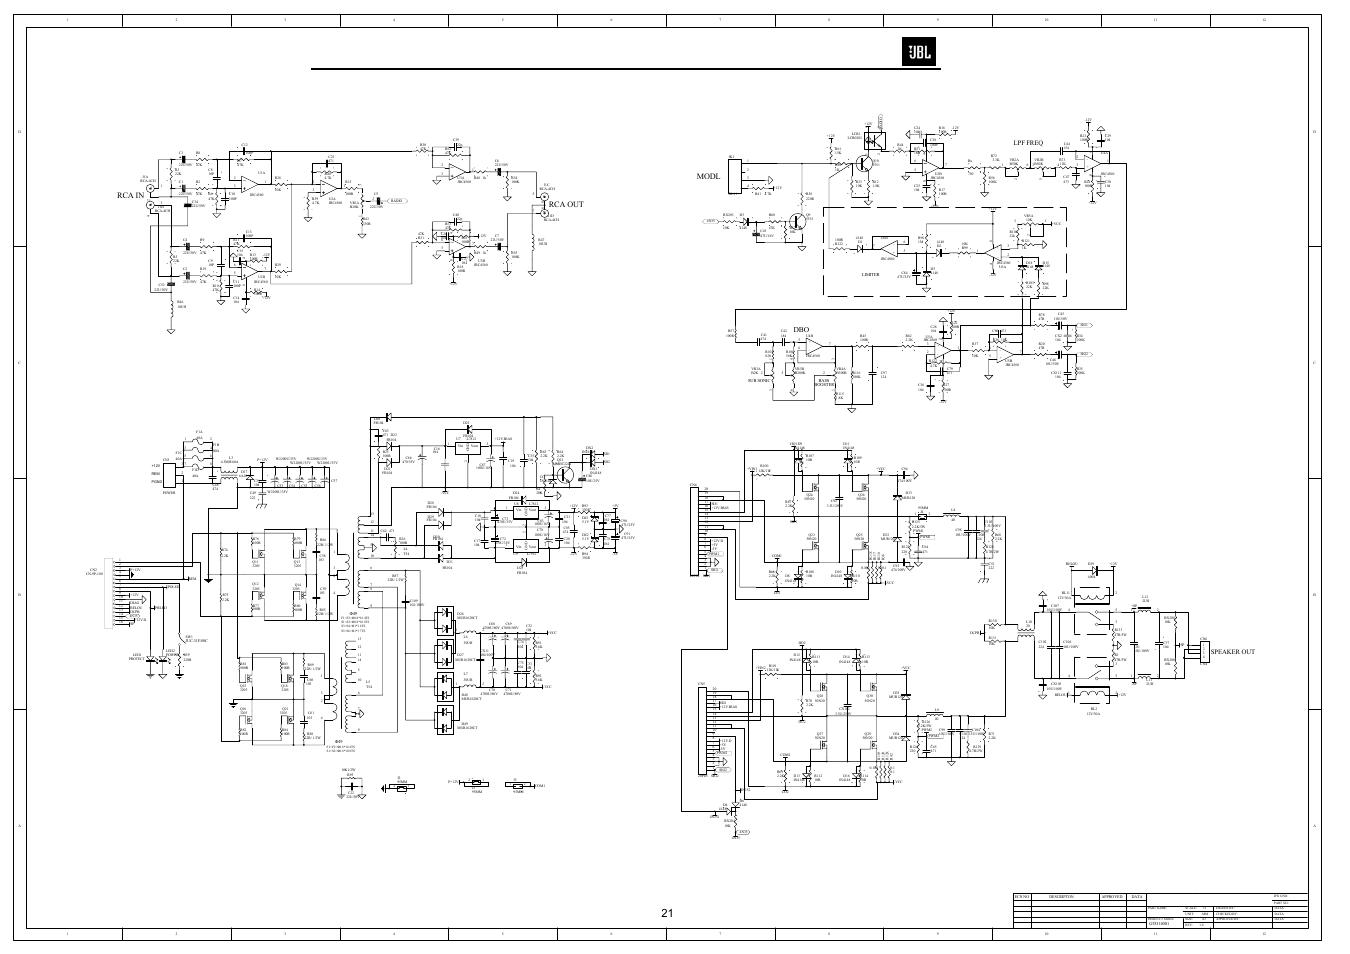 Jbl Manual Sb400 Powered Soundbar Schematic Circuit Diagram Electro Array Schematics Modl Rca In Gto14001 User Page 22 24 Rh Manualsdir Com